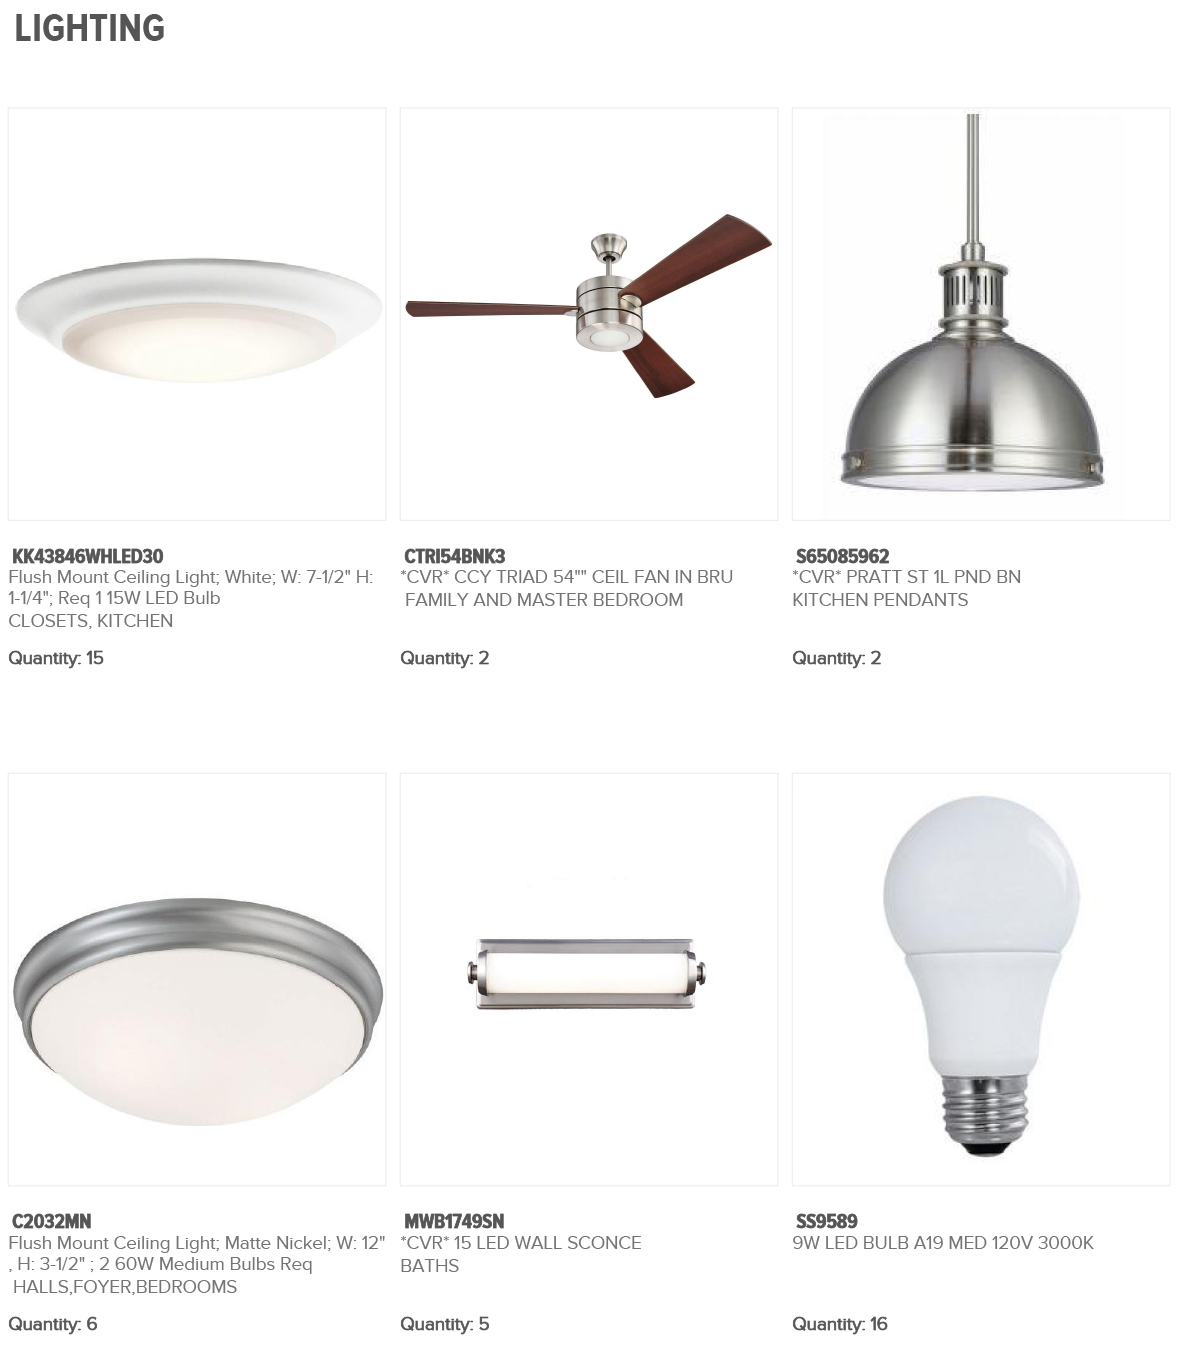 Cutshaw lighting prov-2.jpg